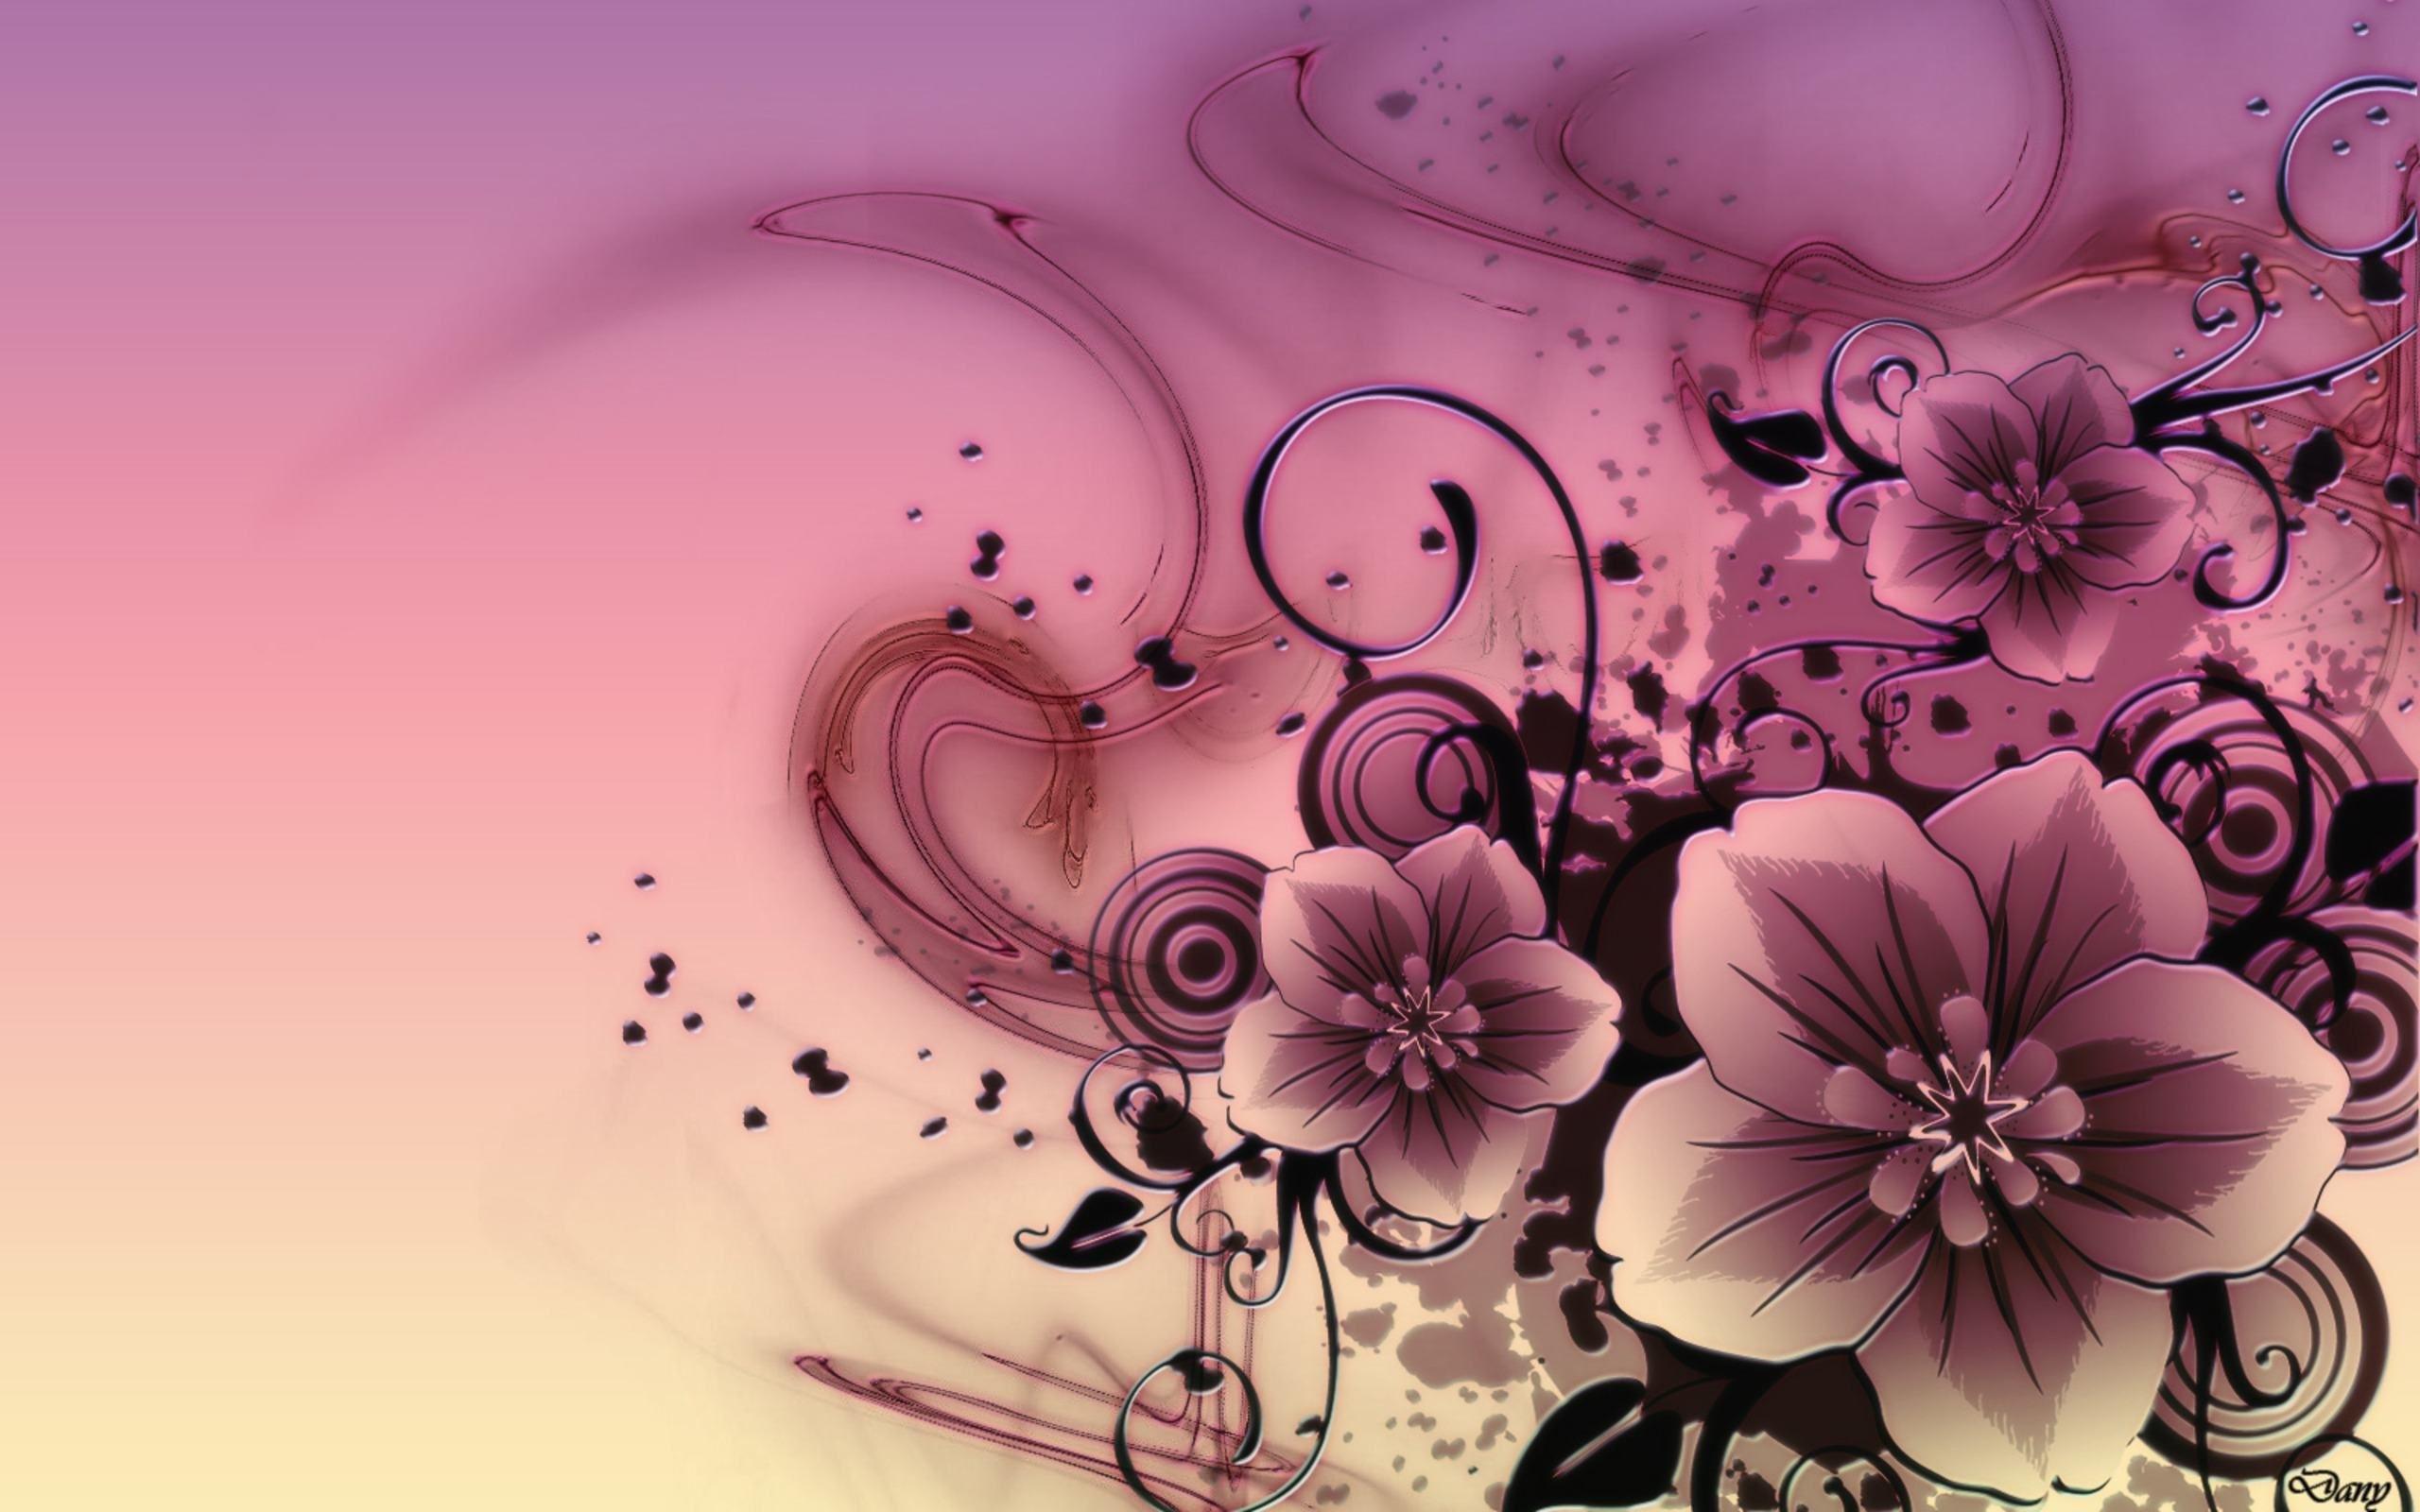 flowers wallpapers for desktop background full screen 7   hd